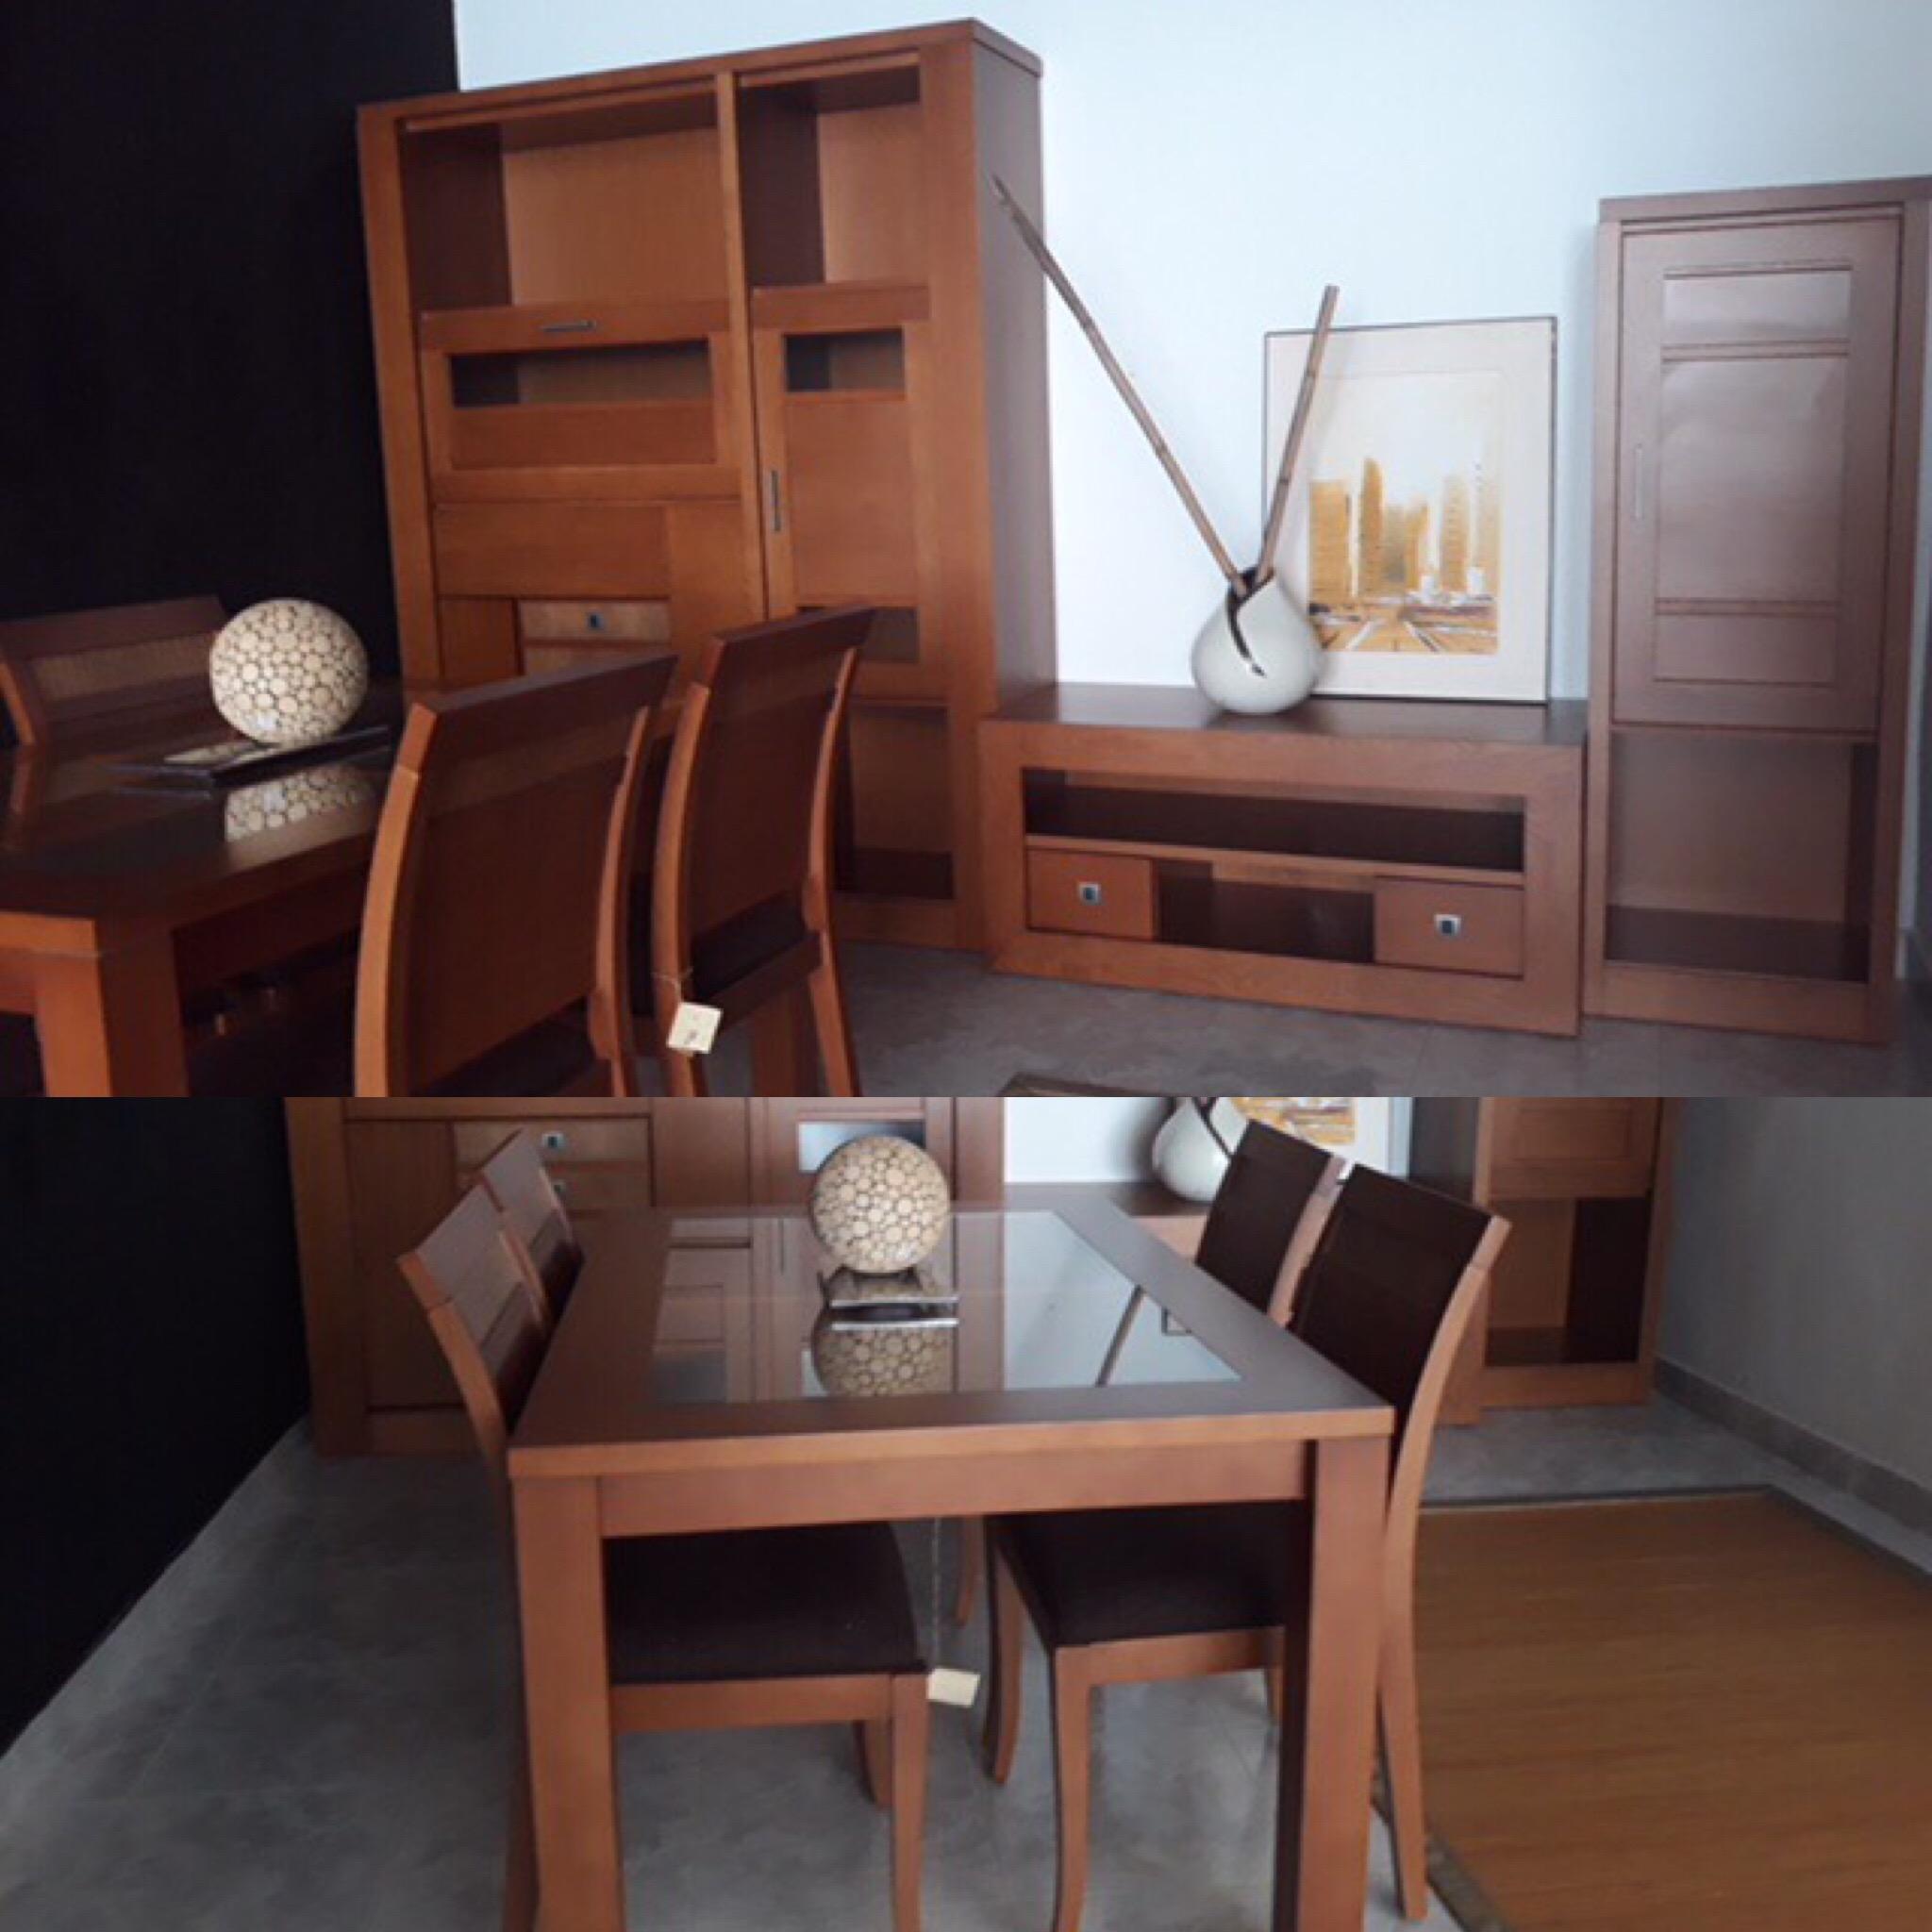 saldo expo muebles lauro vall de ux castell n modular